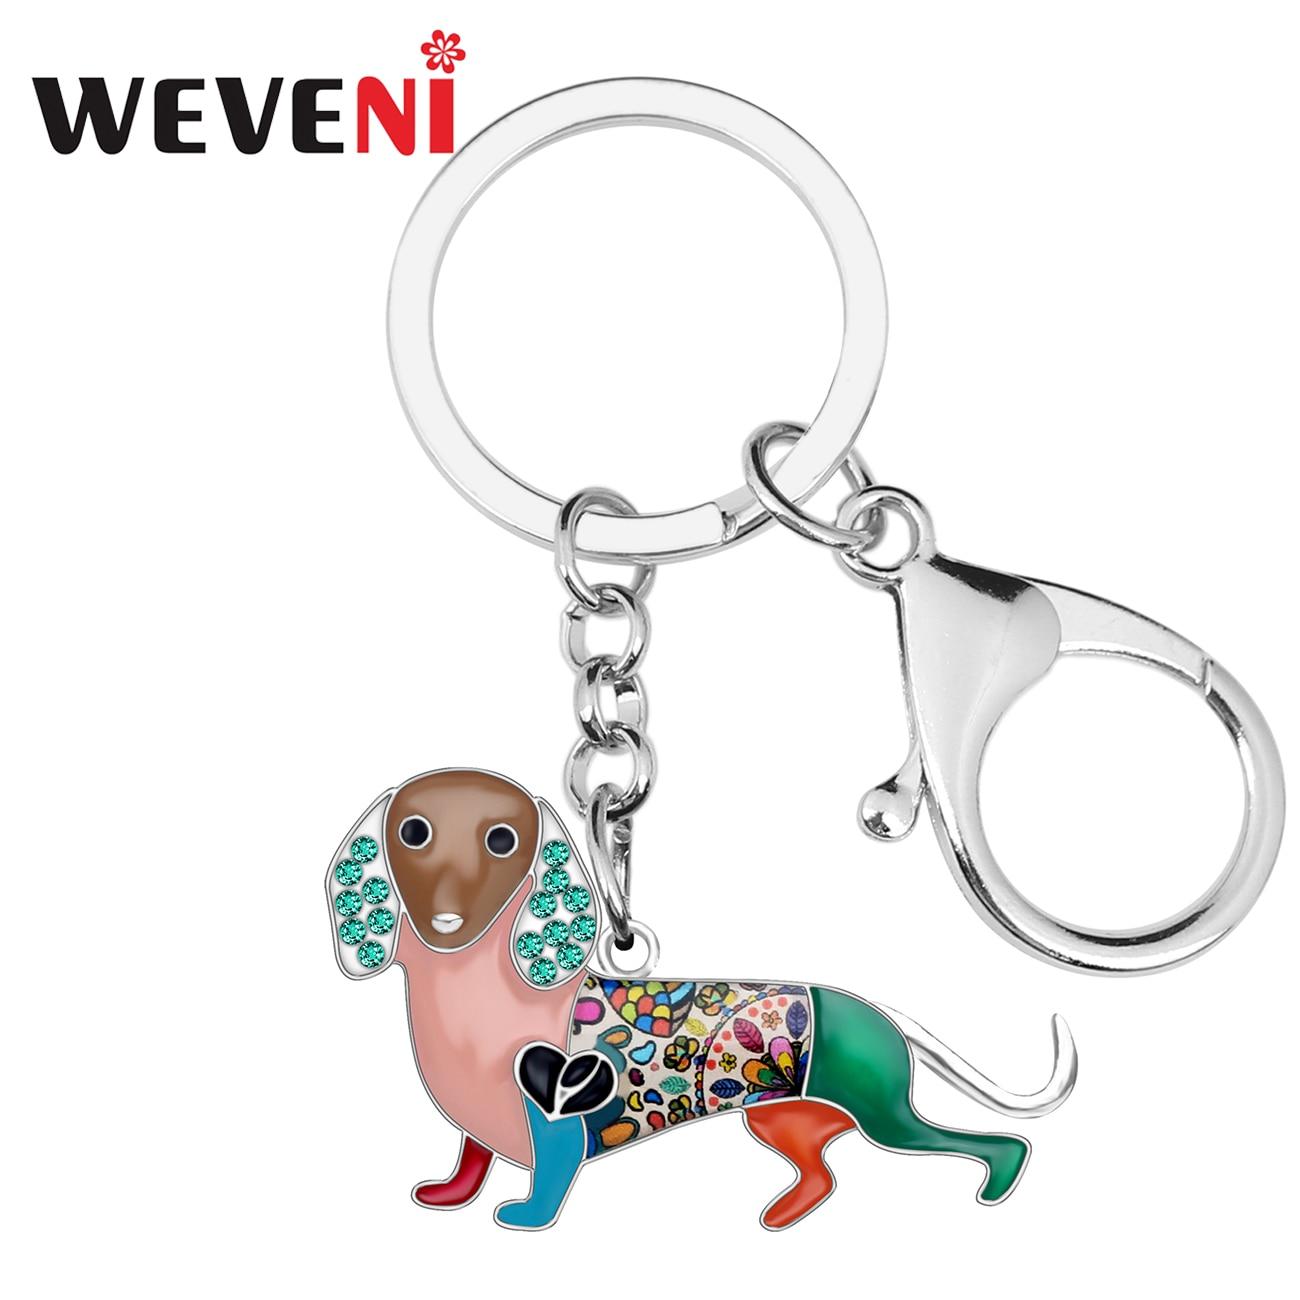 WEVENI Enamel Alloy Rhinestone Dachshund Dog Key Chains Holder Cute Animal Jewelry Gift For Women Girls Bag Purse Charms Pendant